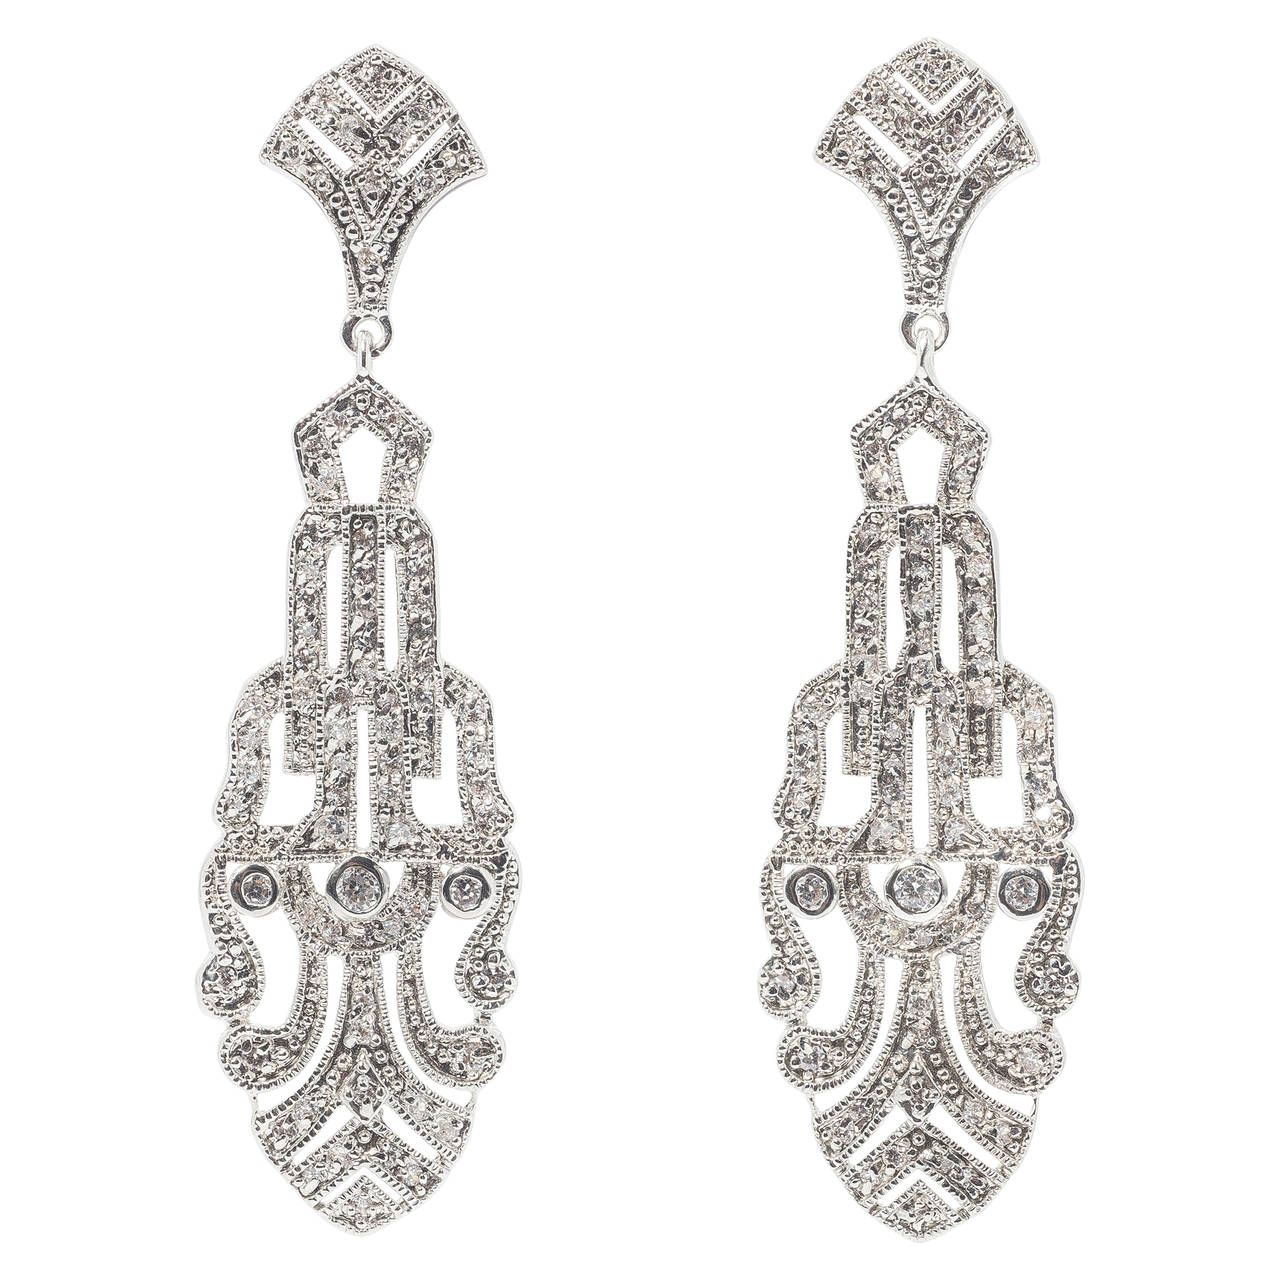 Art deco style faux palmette diamond chandelier earrings diamond art deco style faux palmette diamond chandelier earrings from a unique collection of vintage chandelier arubaitofo Choice Image